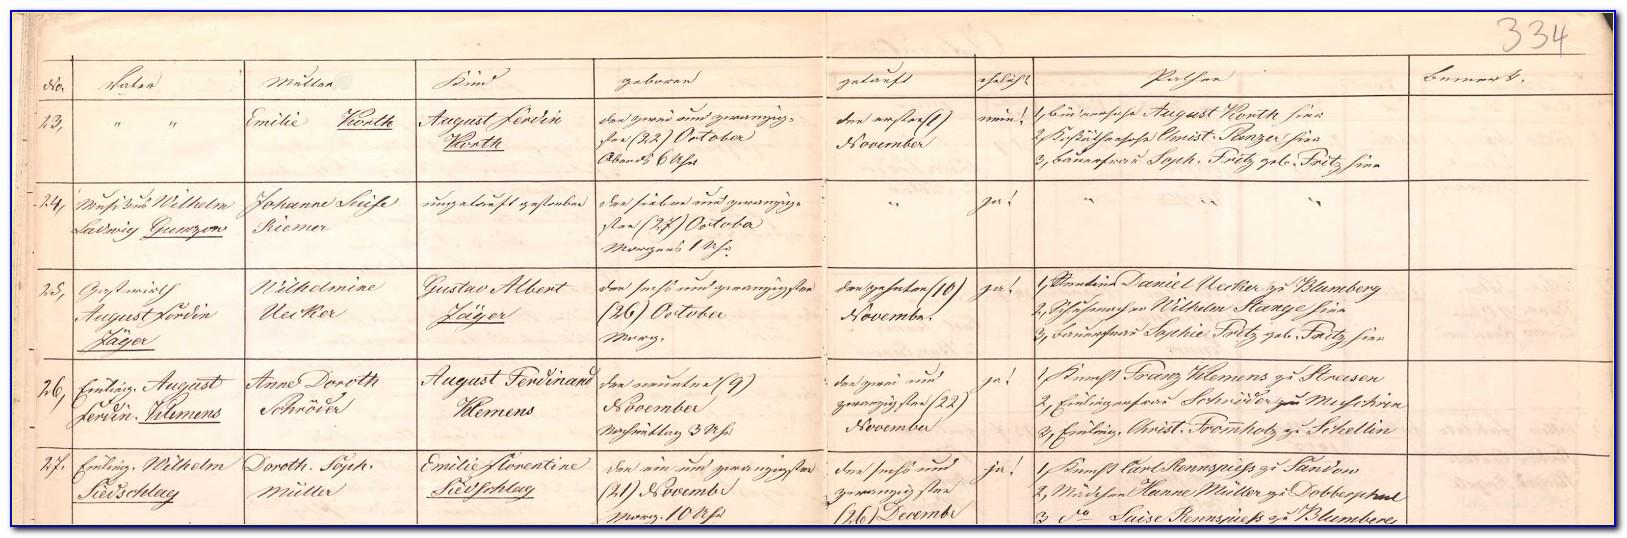 Mecklenburg County Birth Record